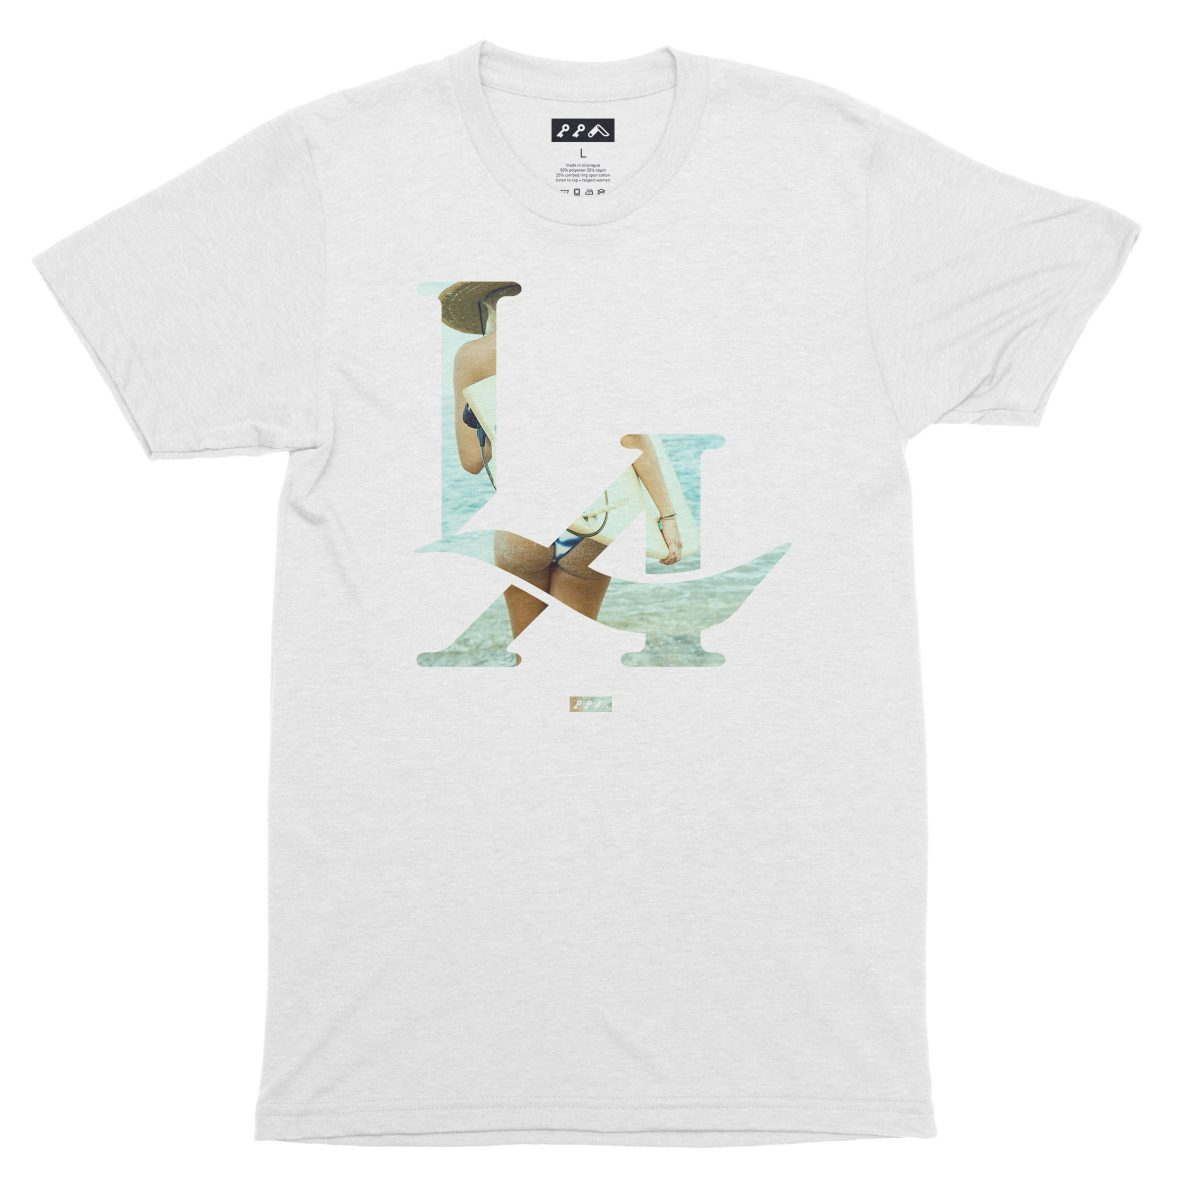 LA logo los angeles surfs up bikini beach butt t-shirt in white fleck by kikicutt